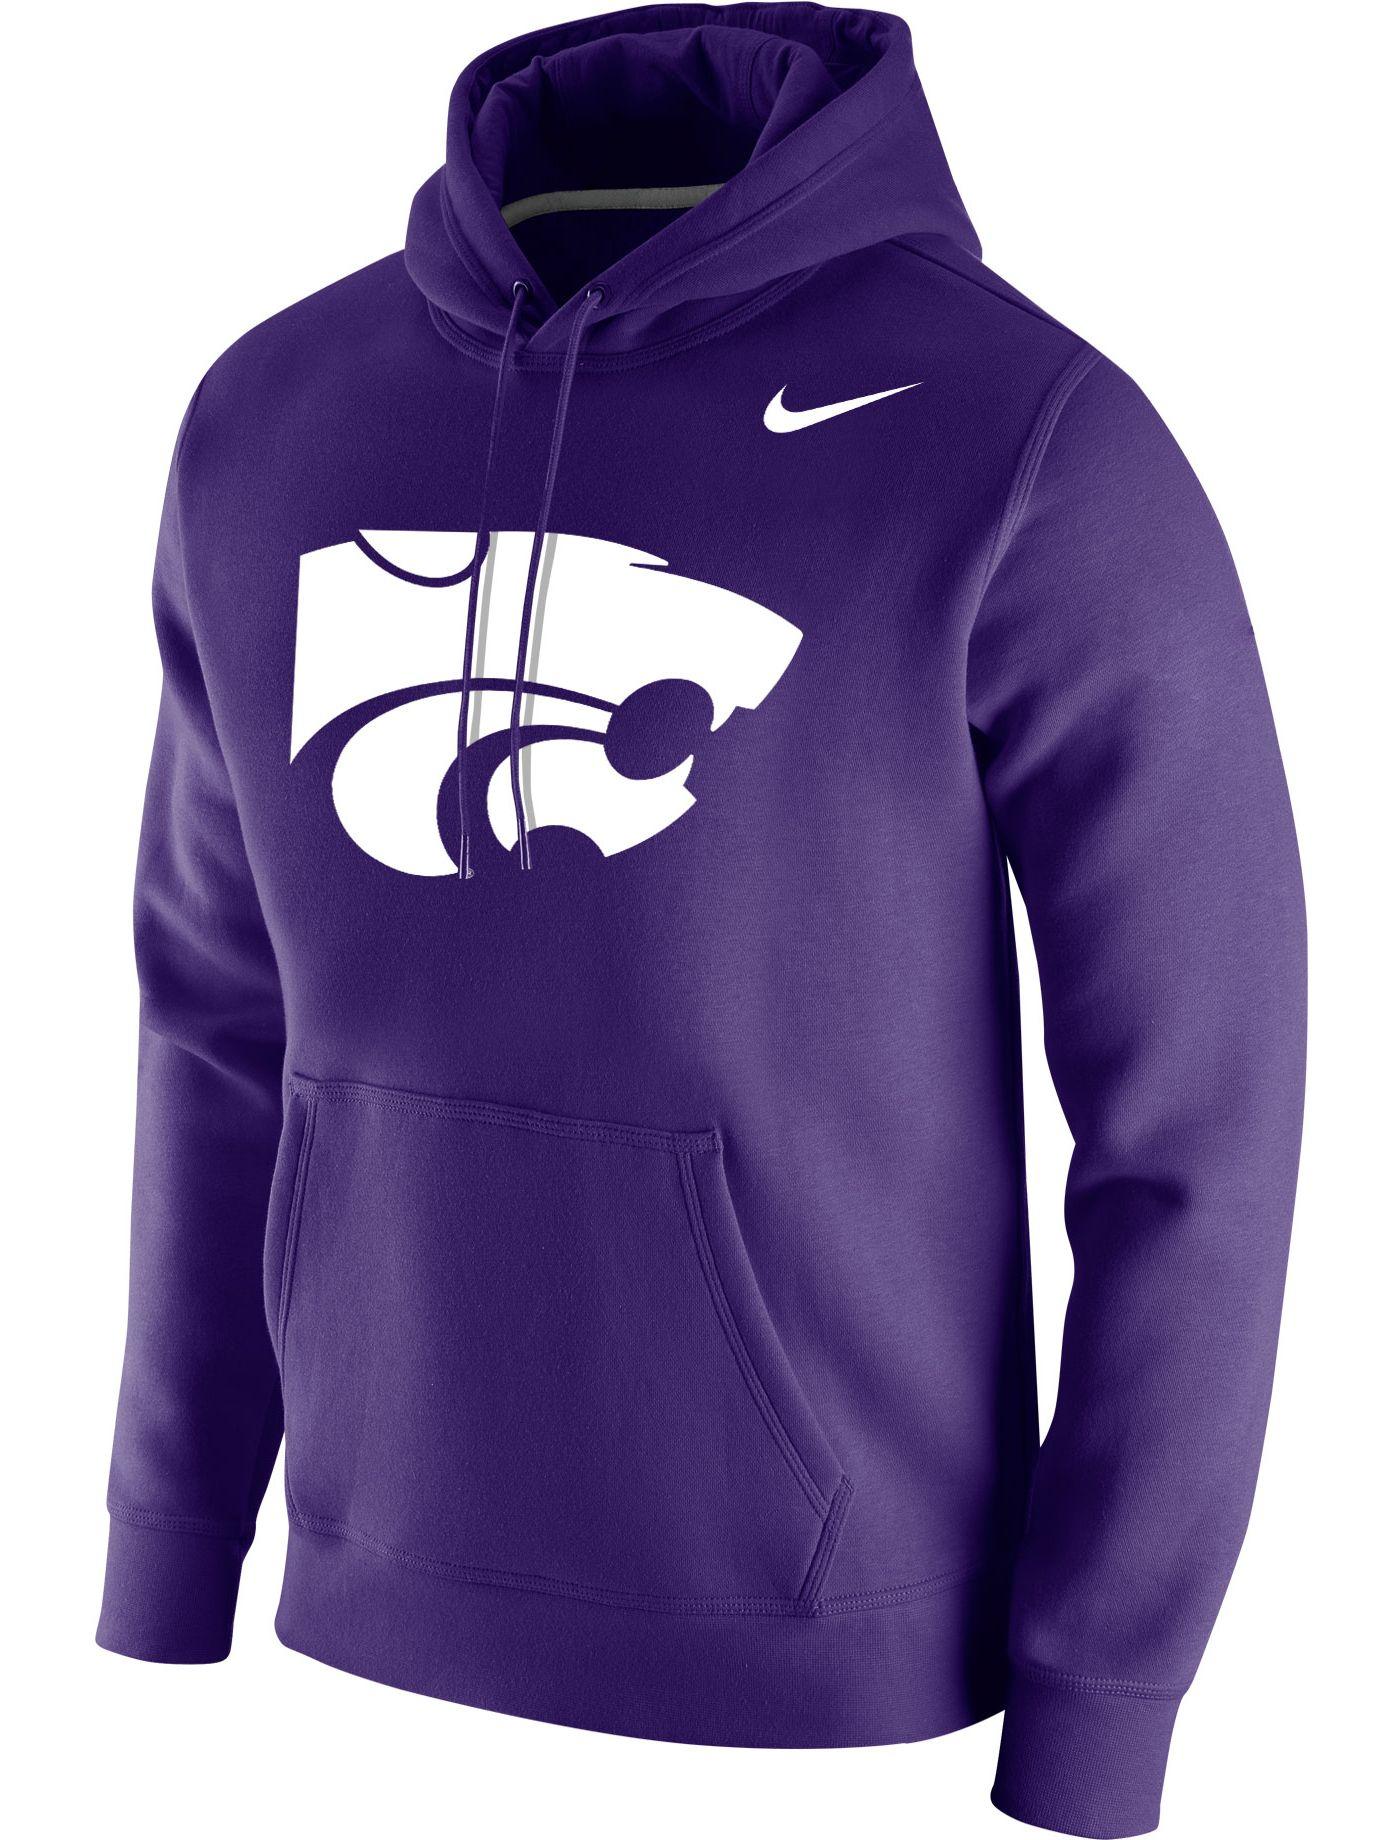 Nike Men's Kansas State Wildcats Purple Club Fleece Pullover Hoodie